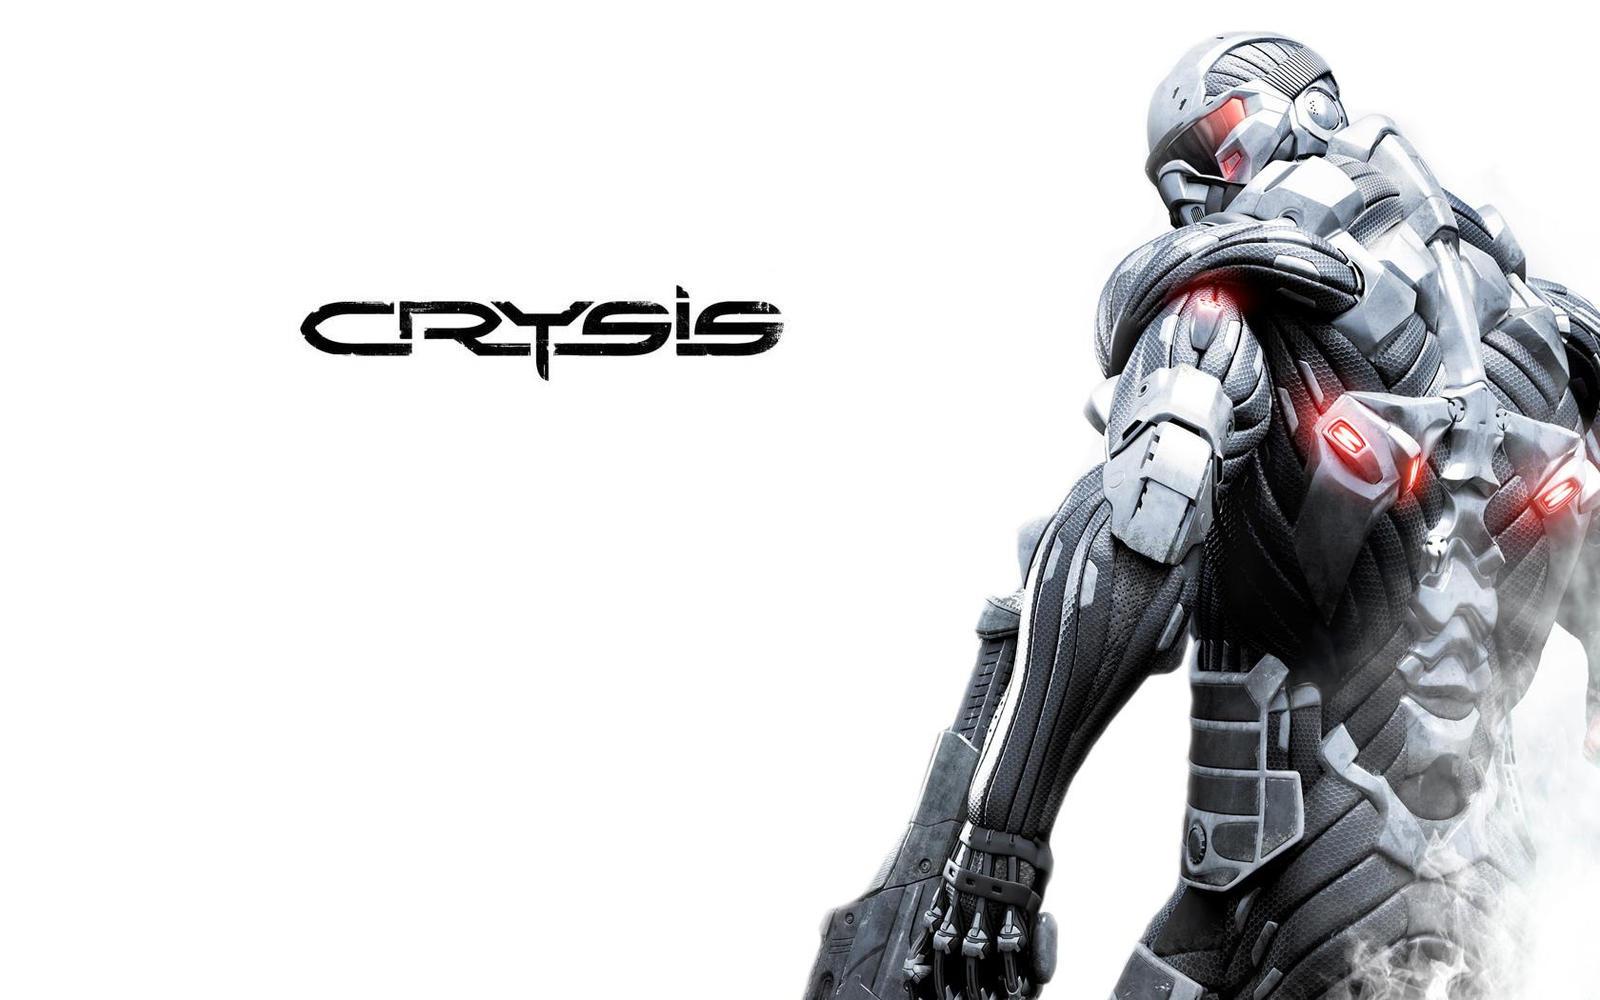 crysis 4 wallpaper hd - photo #30